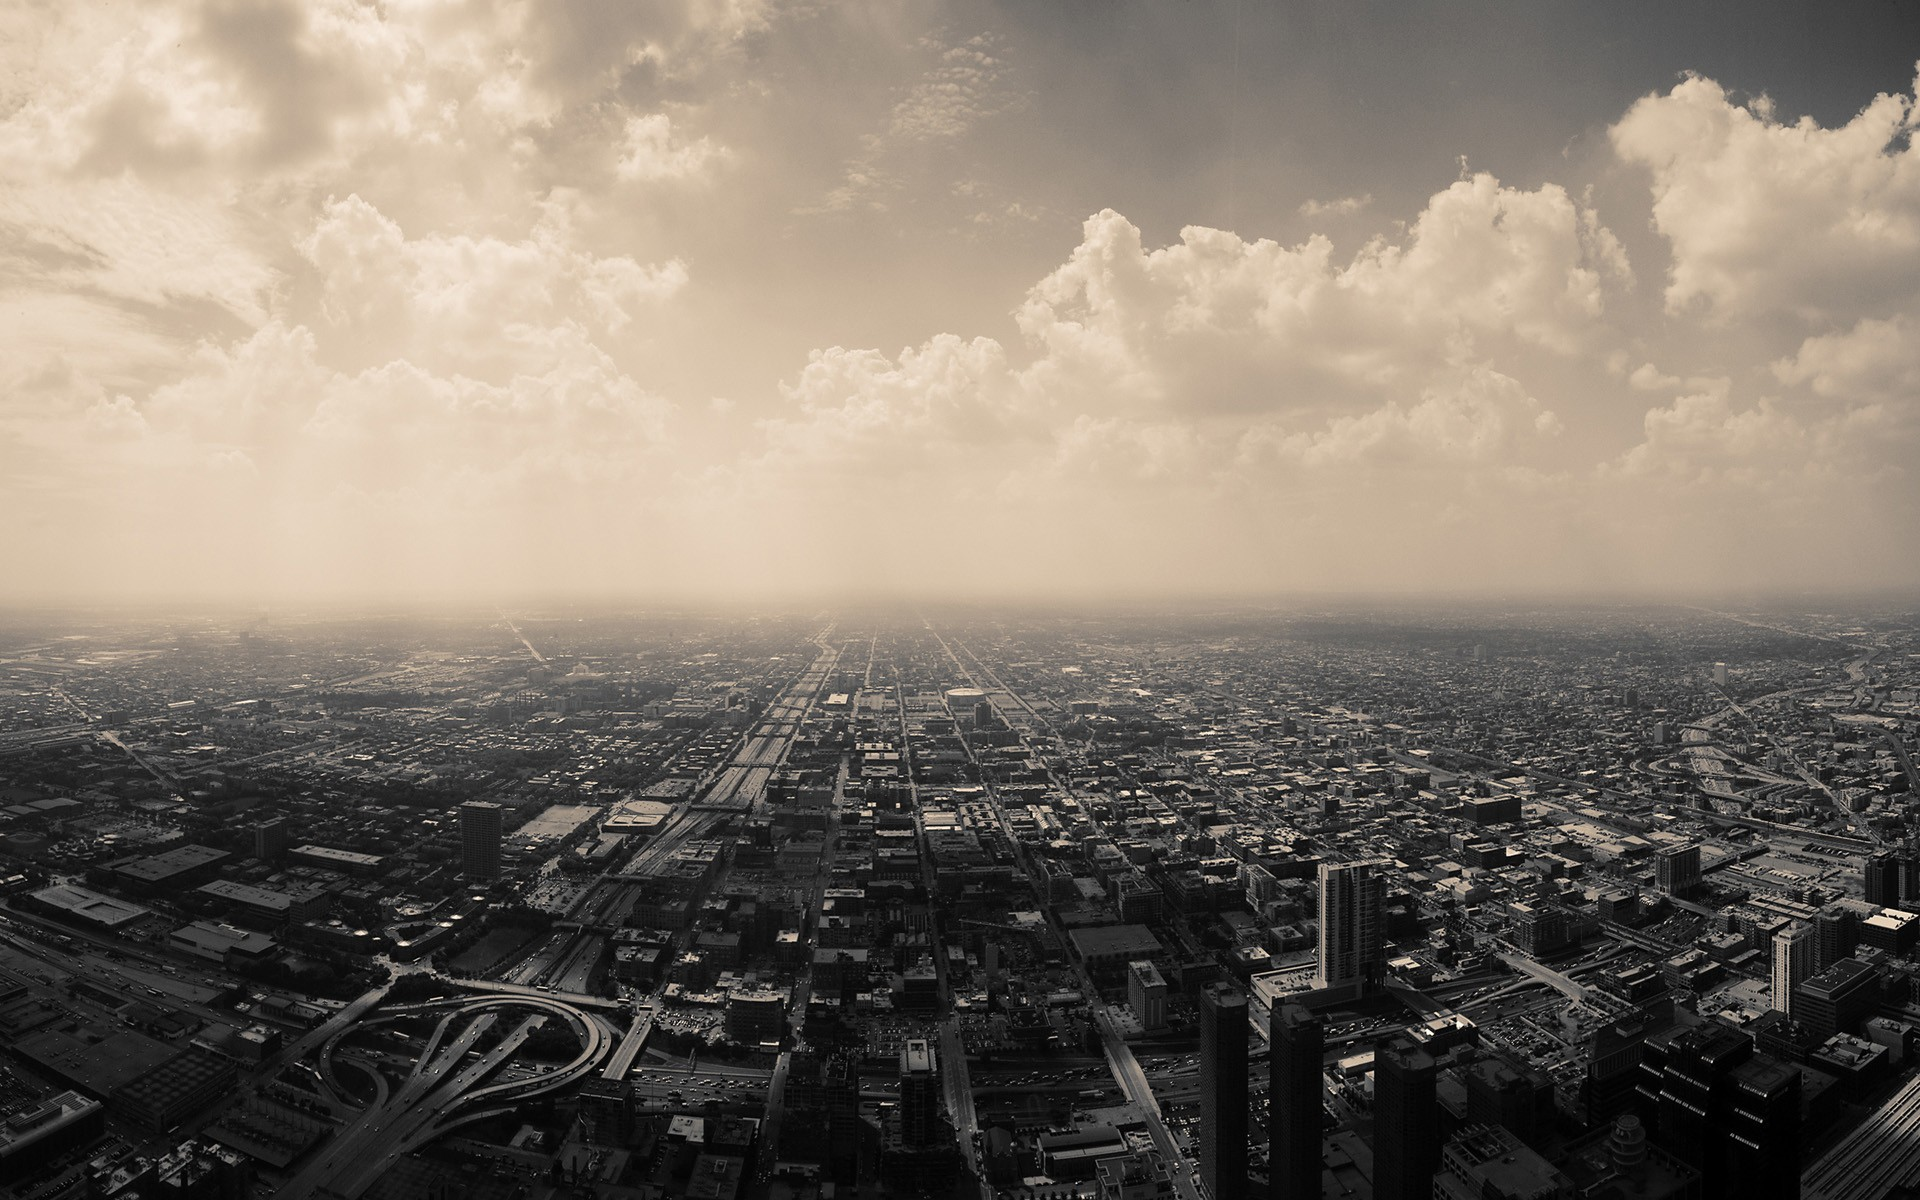 Chicago Cityscape Sky Clouds USA City Building 1920x1200